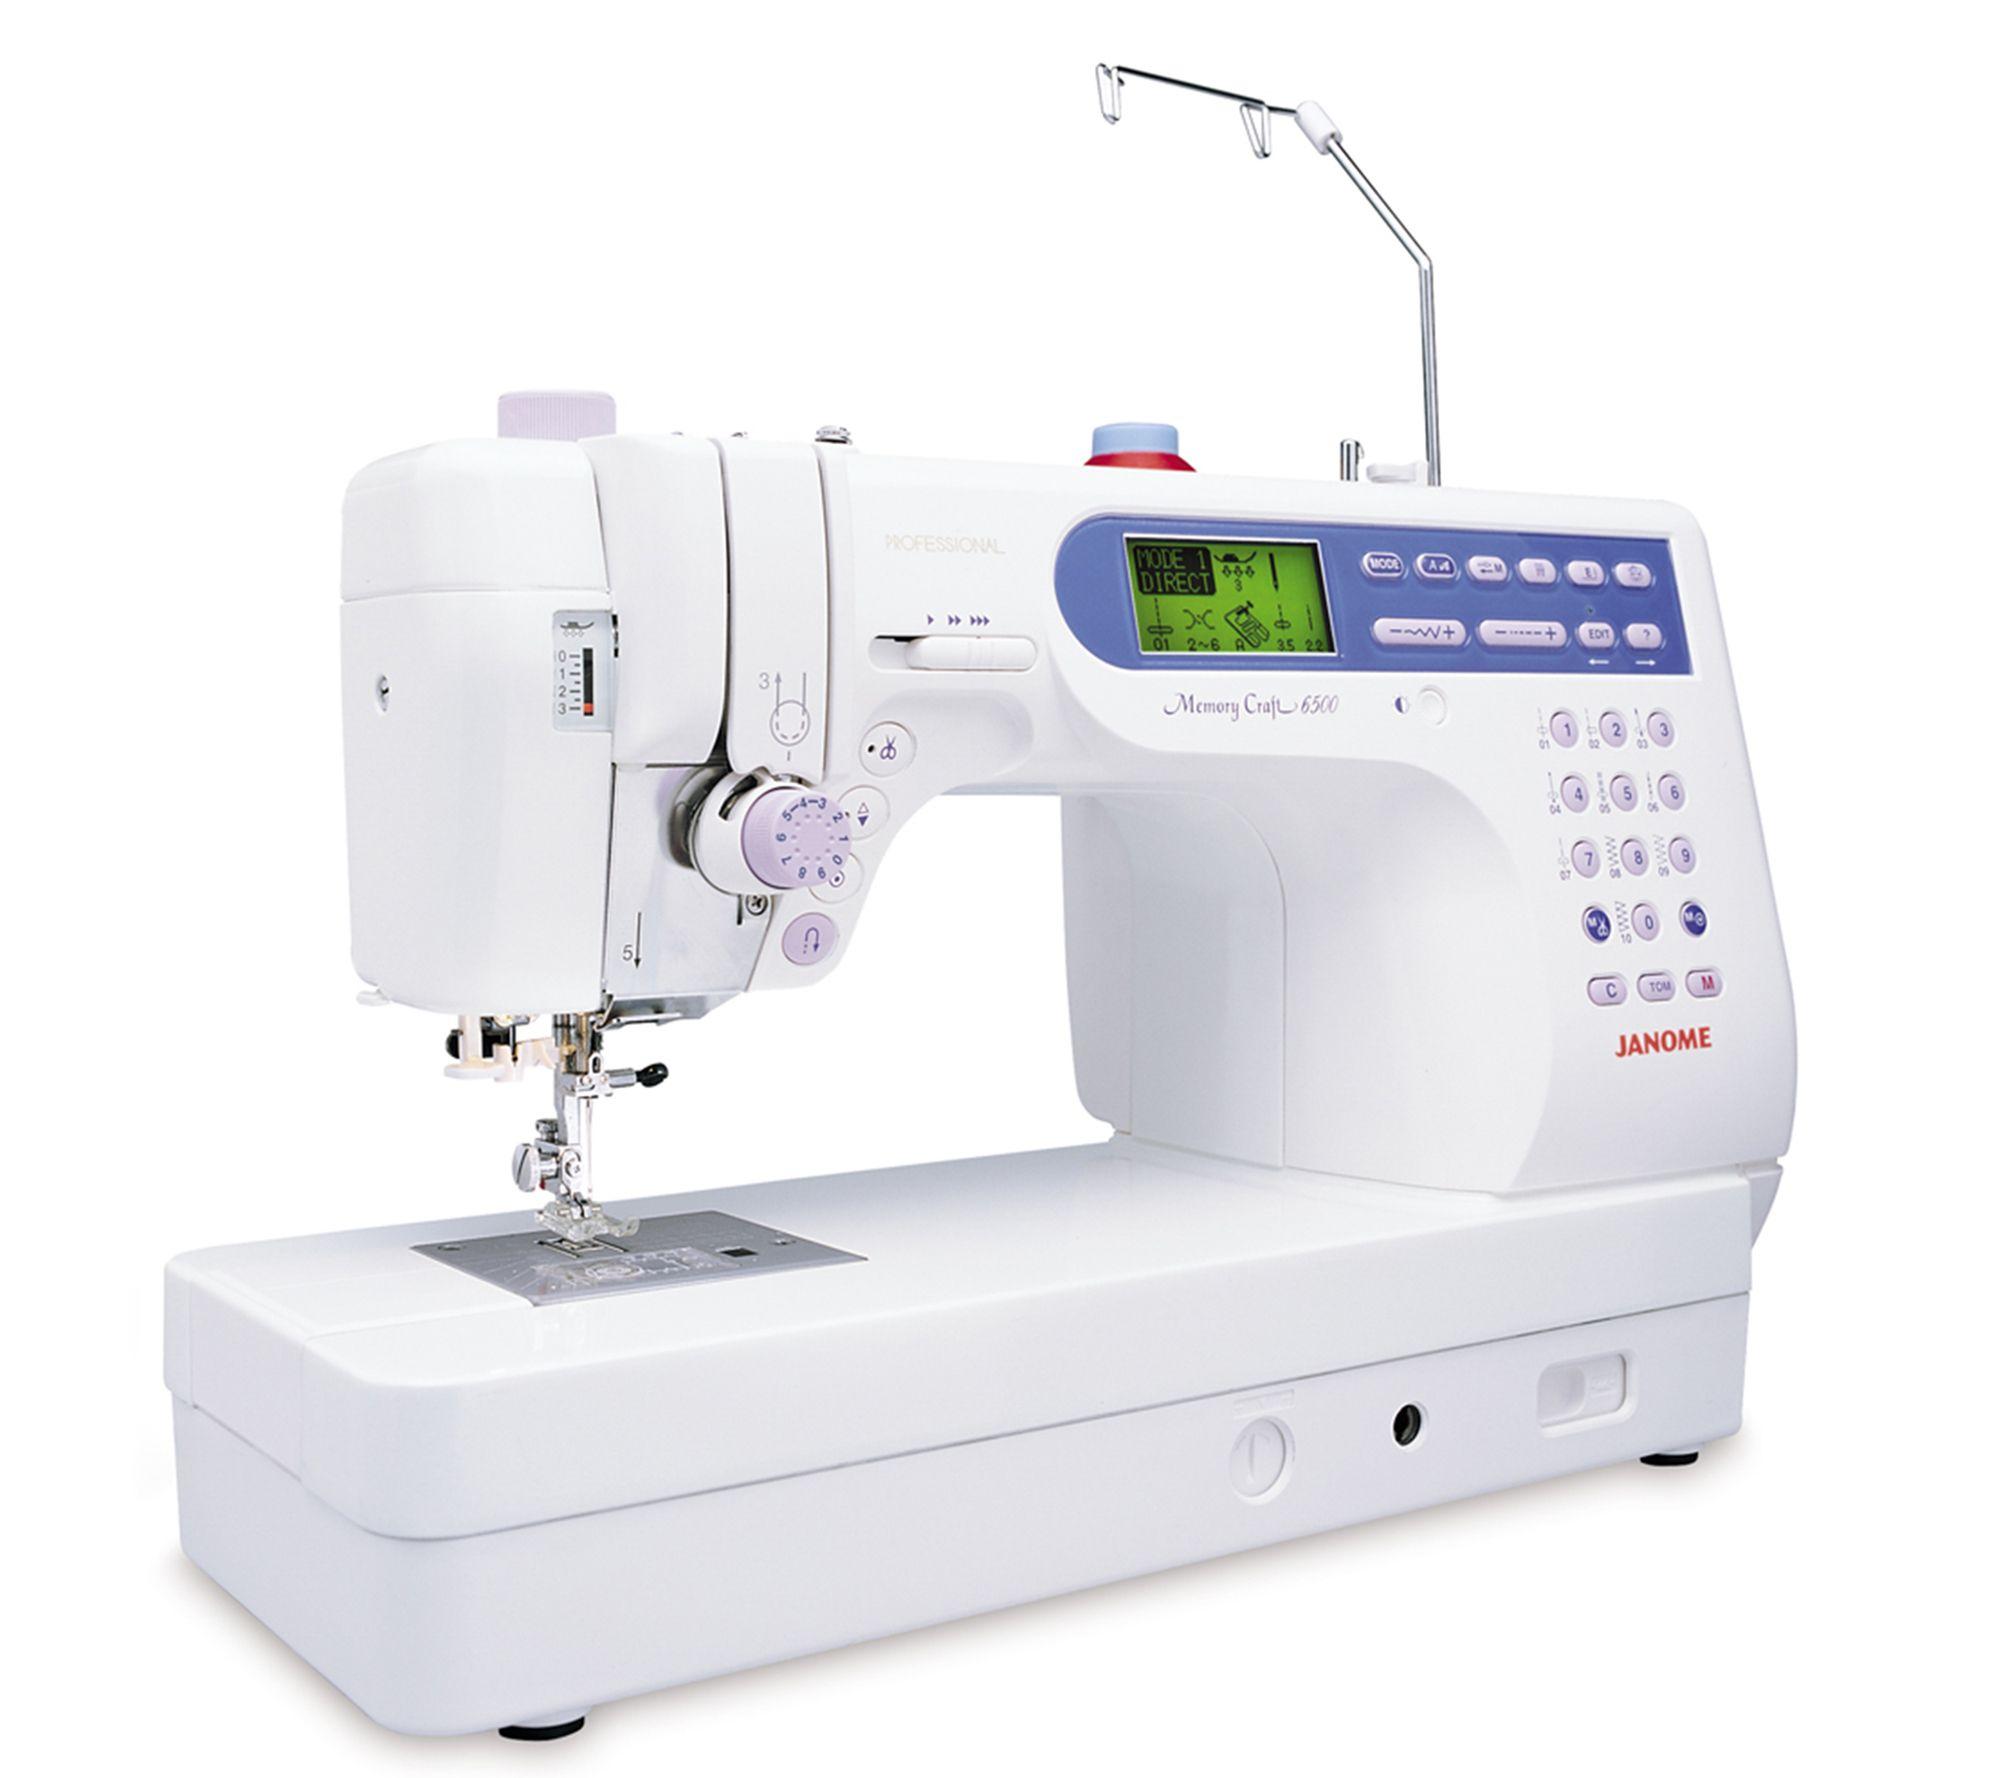 main shop quilting janome htm web new memory machine craft p quilt c